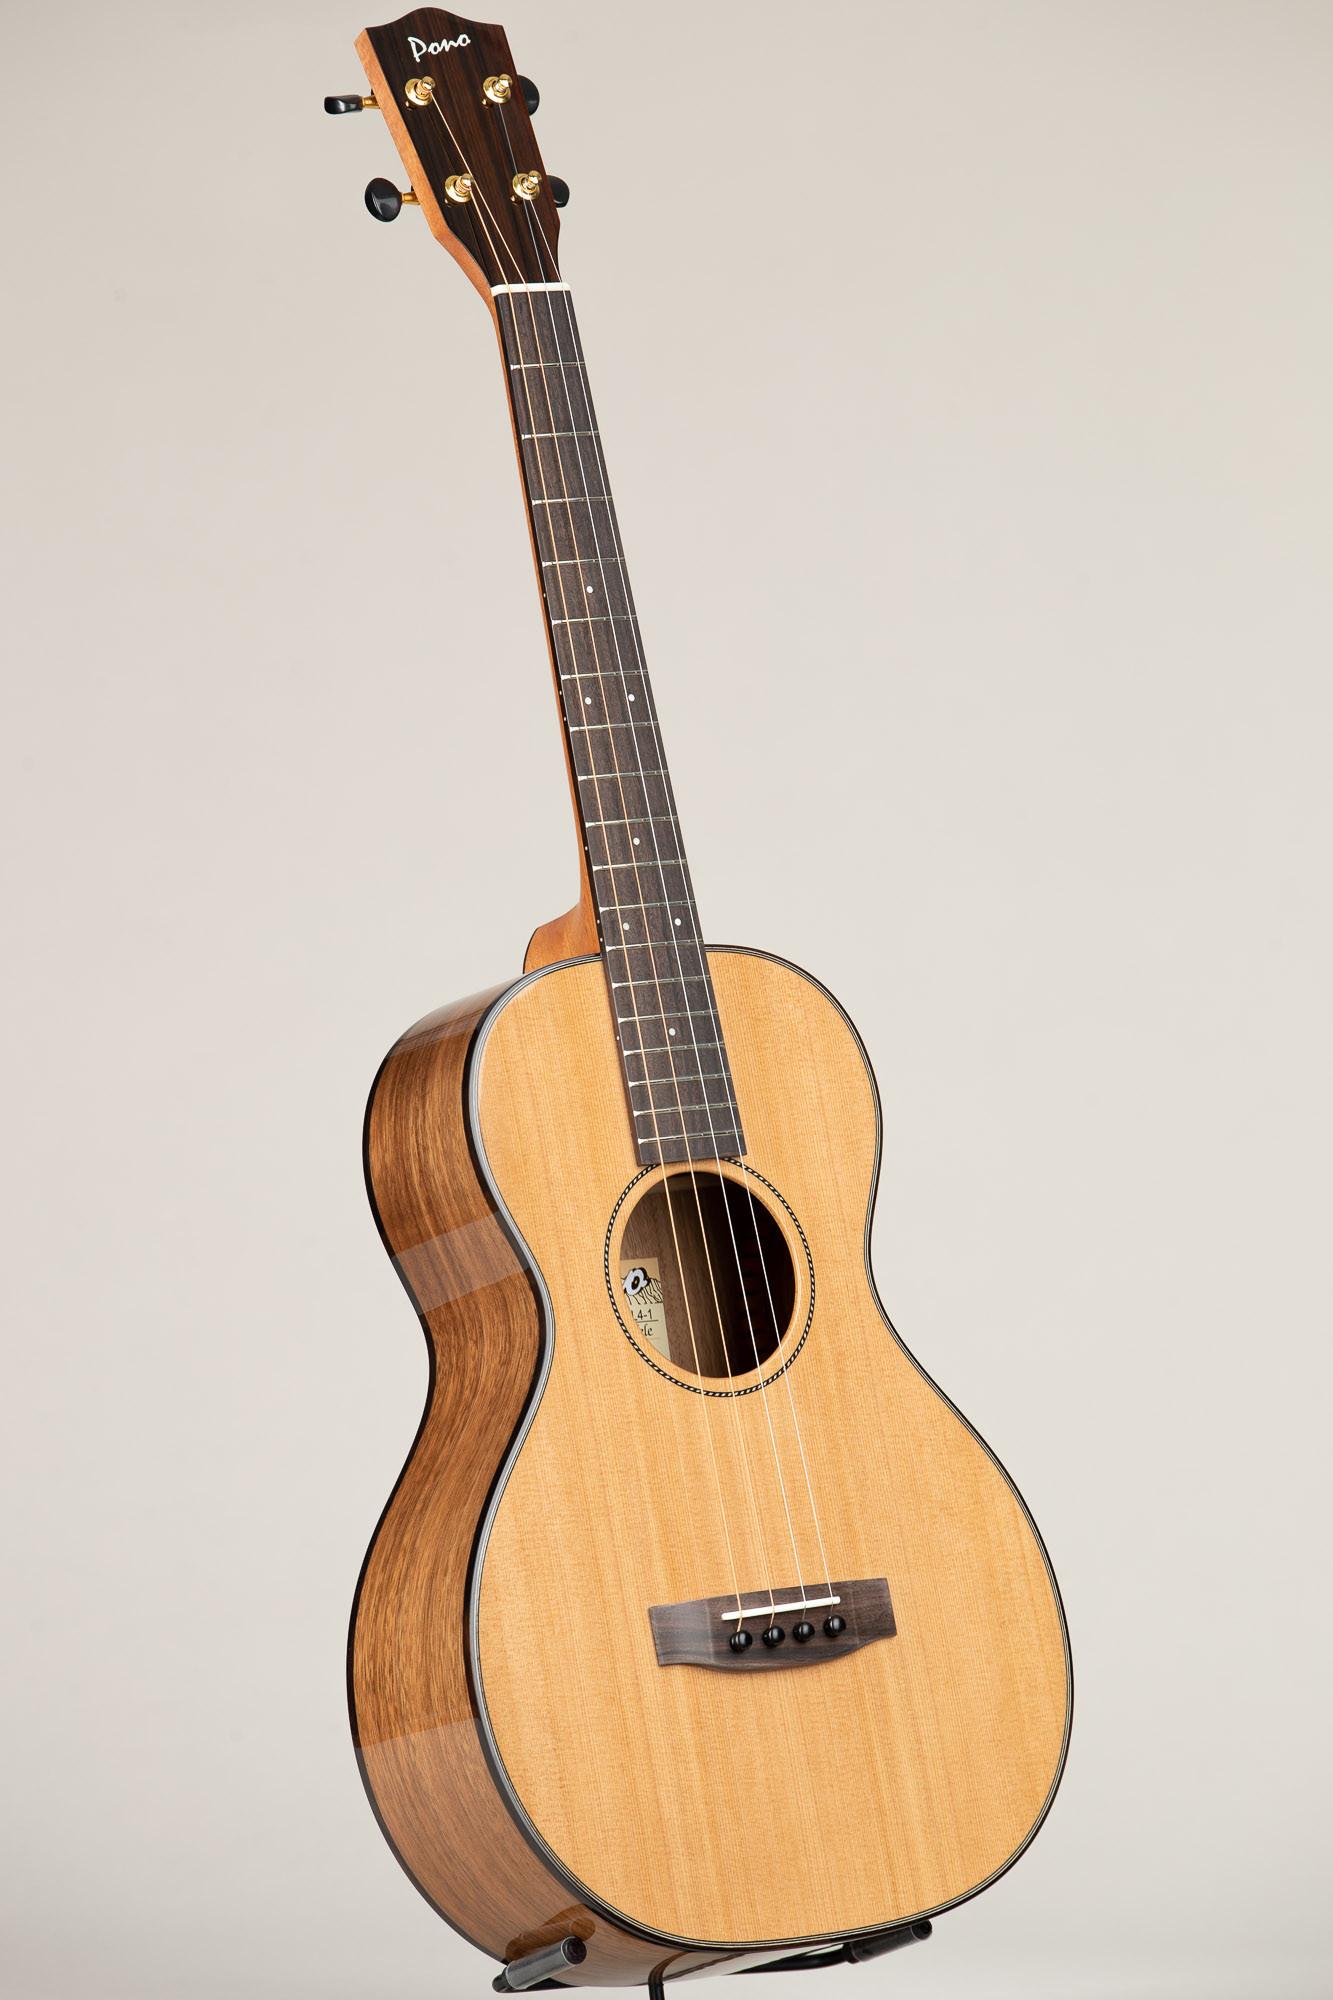 Pono Cedar Acacia Steel String Baritone (UL4-1 2897)